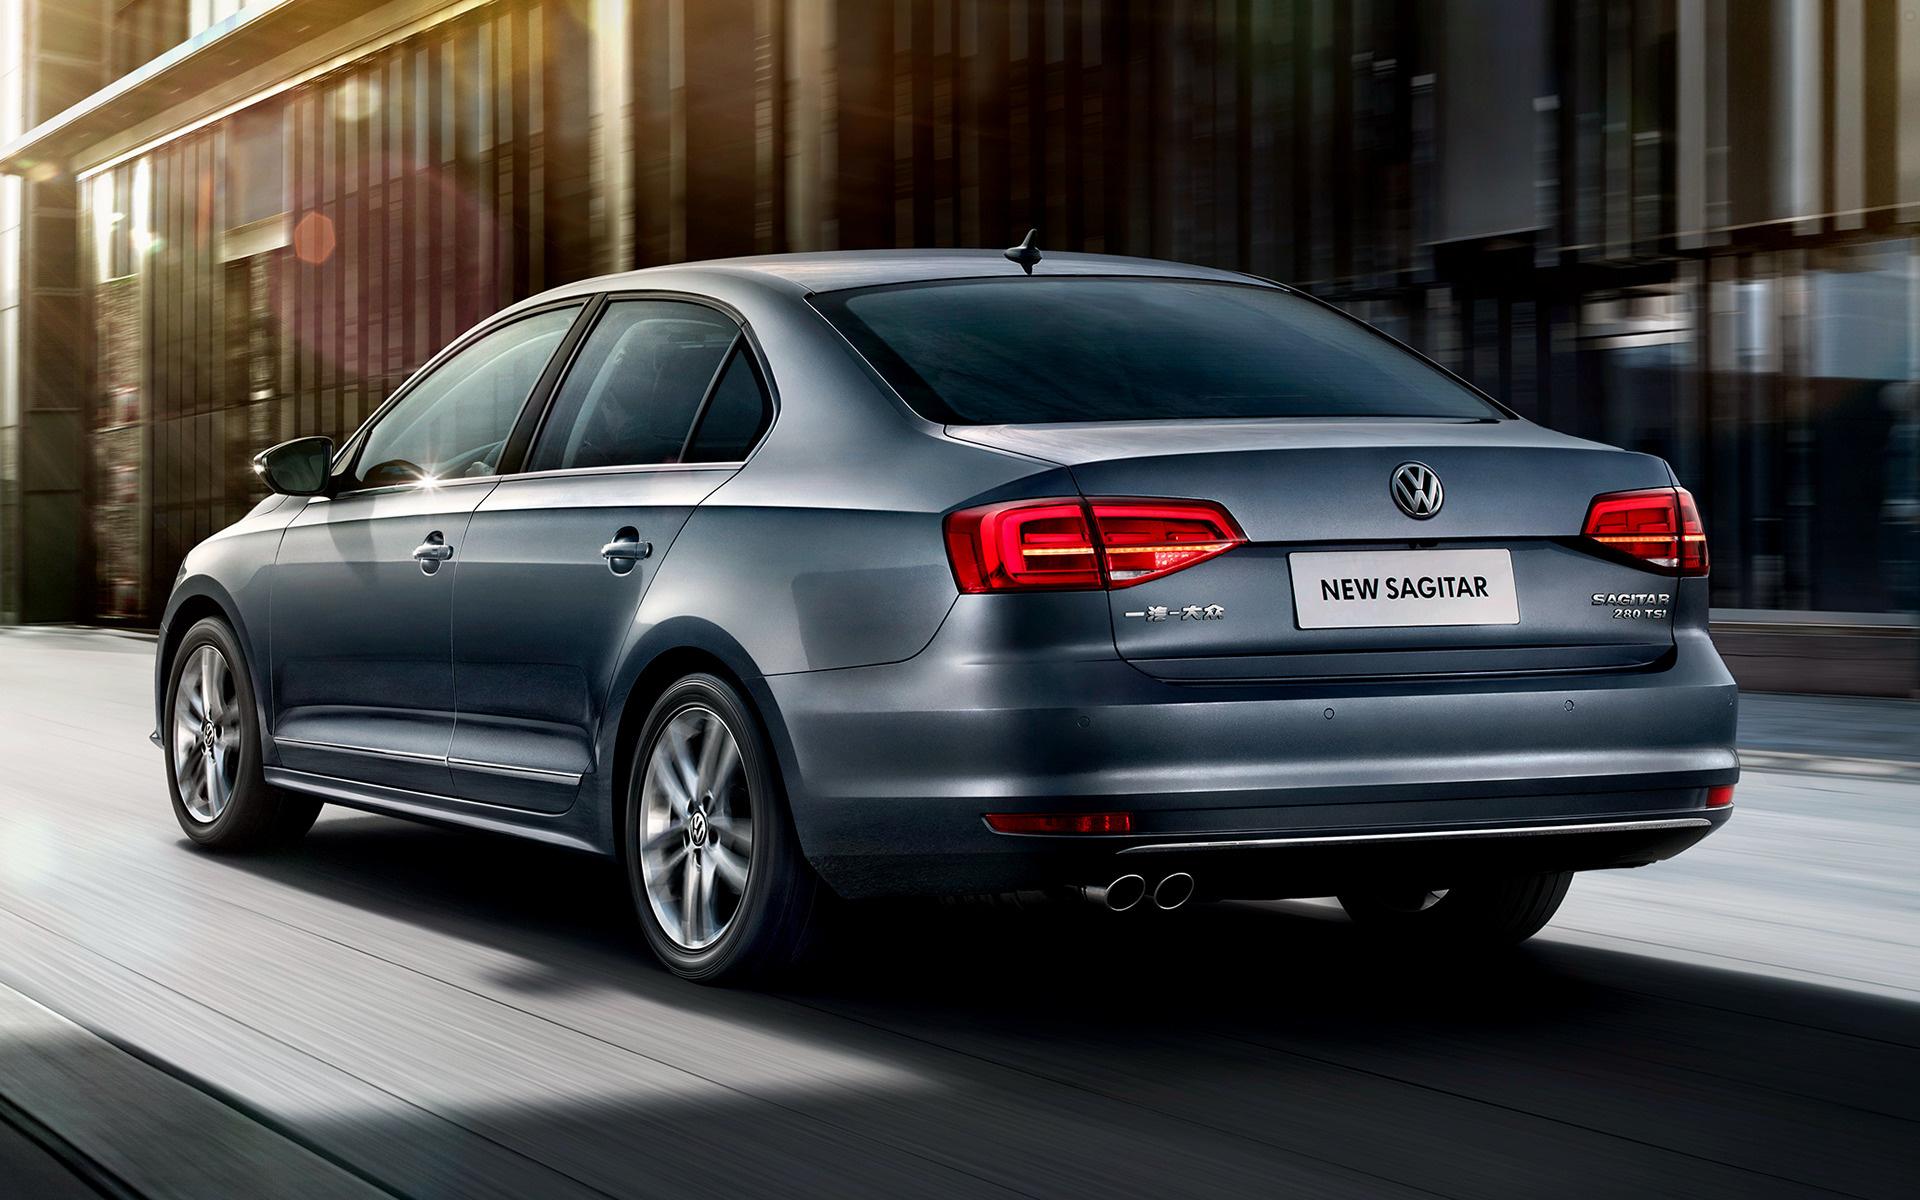 2015 Volkswagen Sagitar Wallpapers And Hd Images Car Pixel